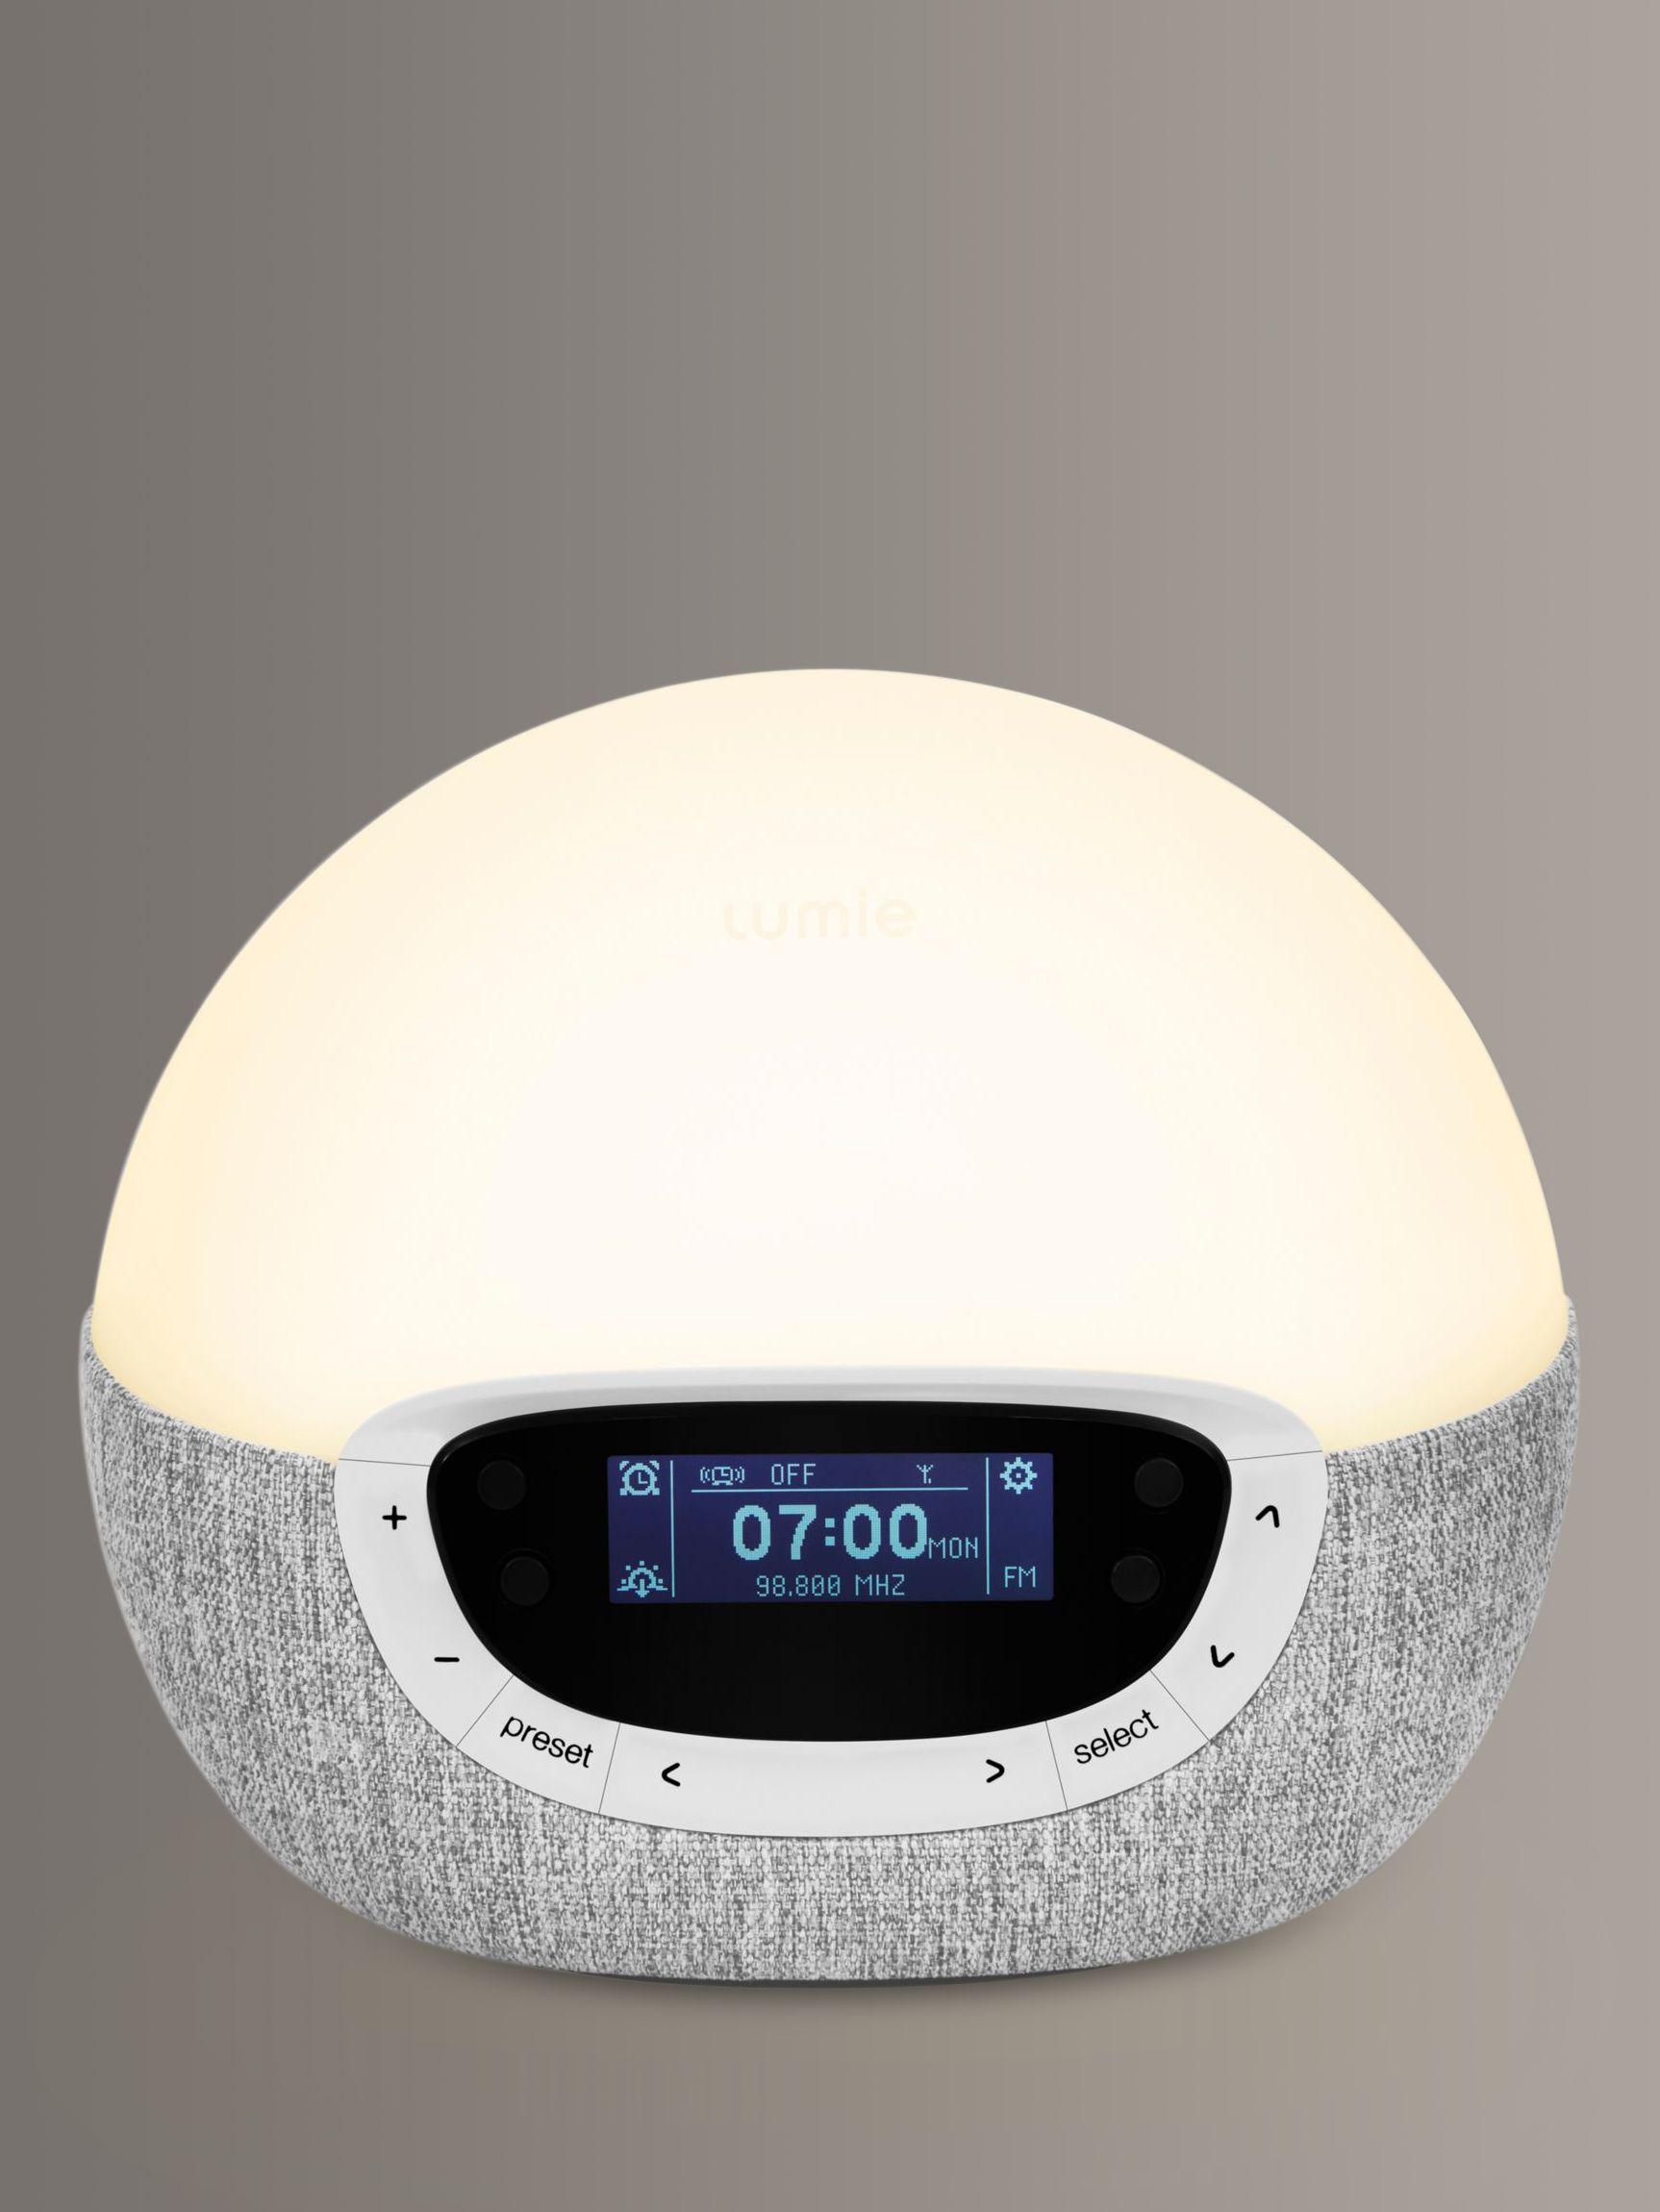 Lumie Lumie Bodyclock Shine 300 Wake up to Daylight SAD Light